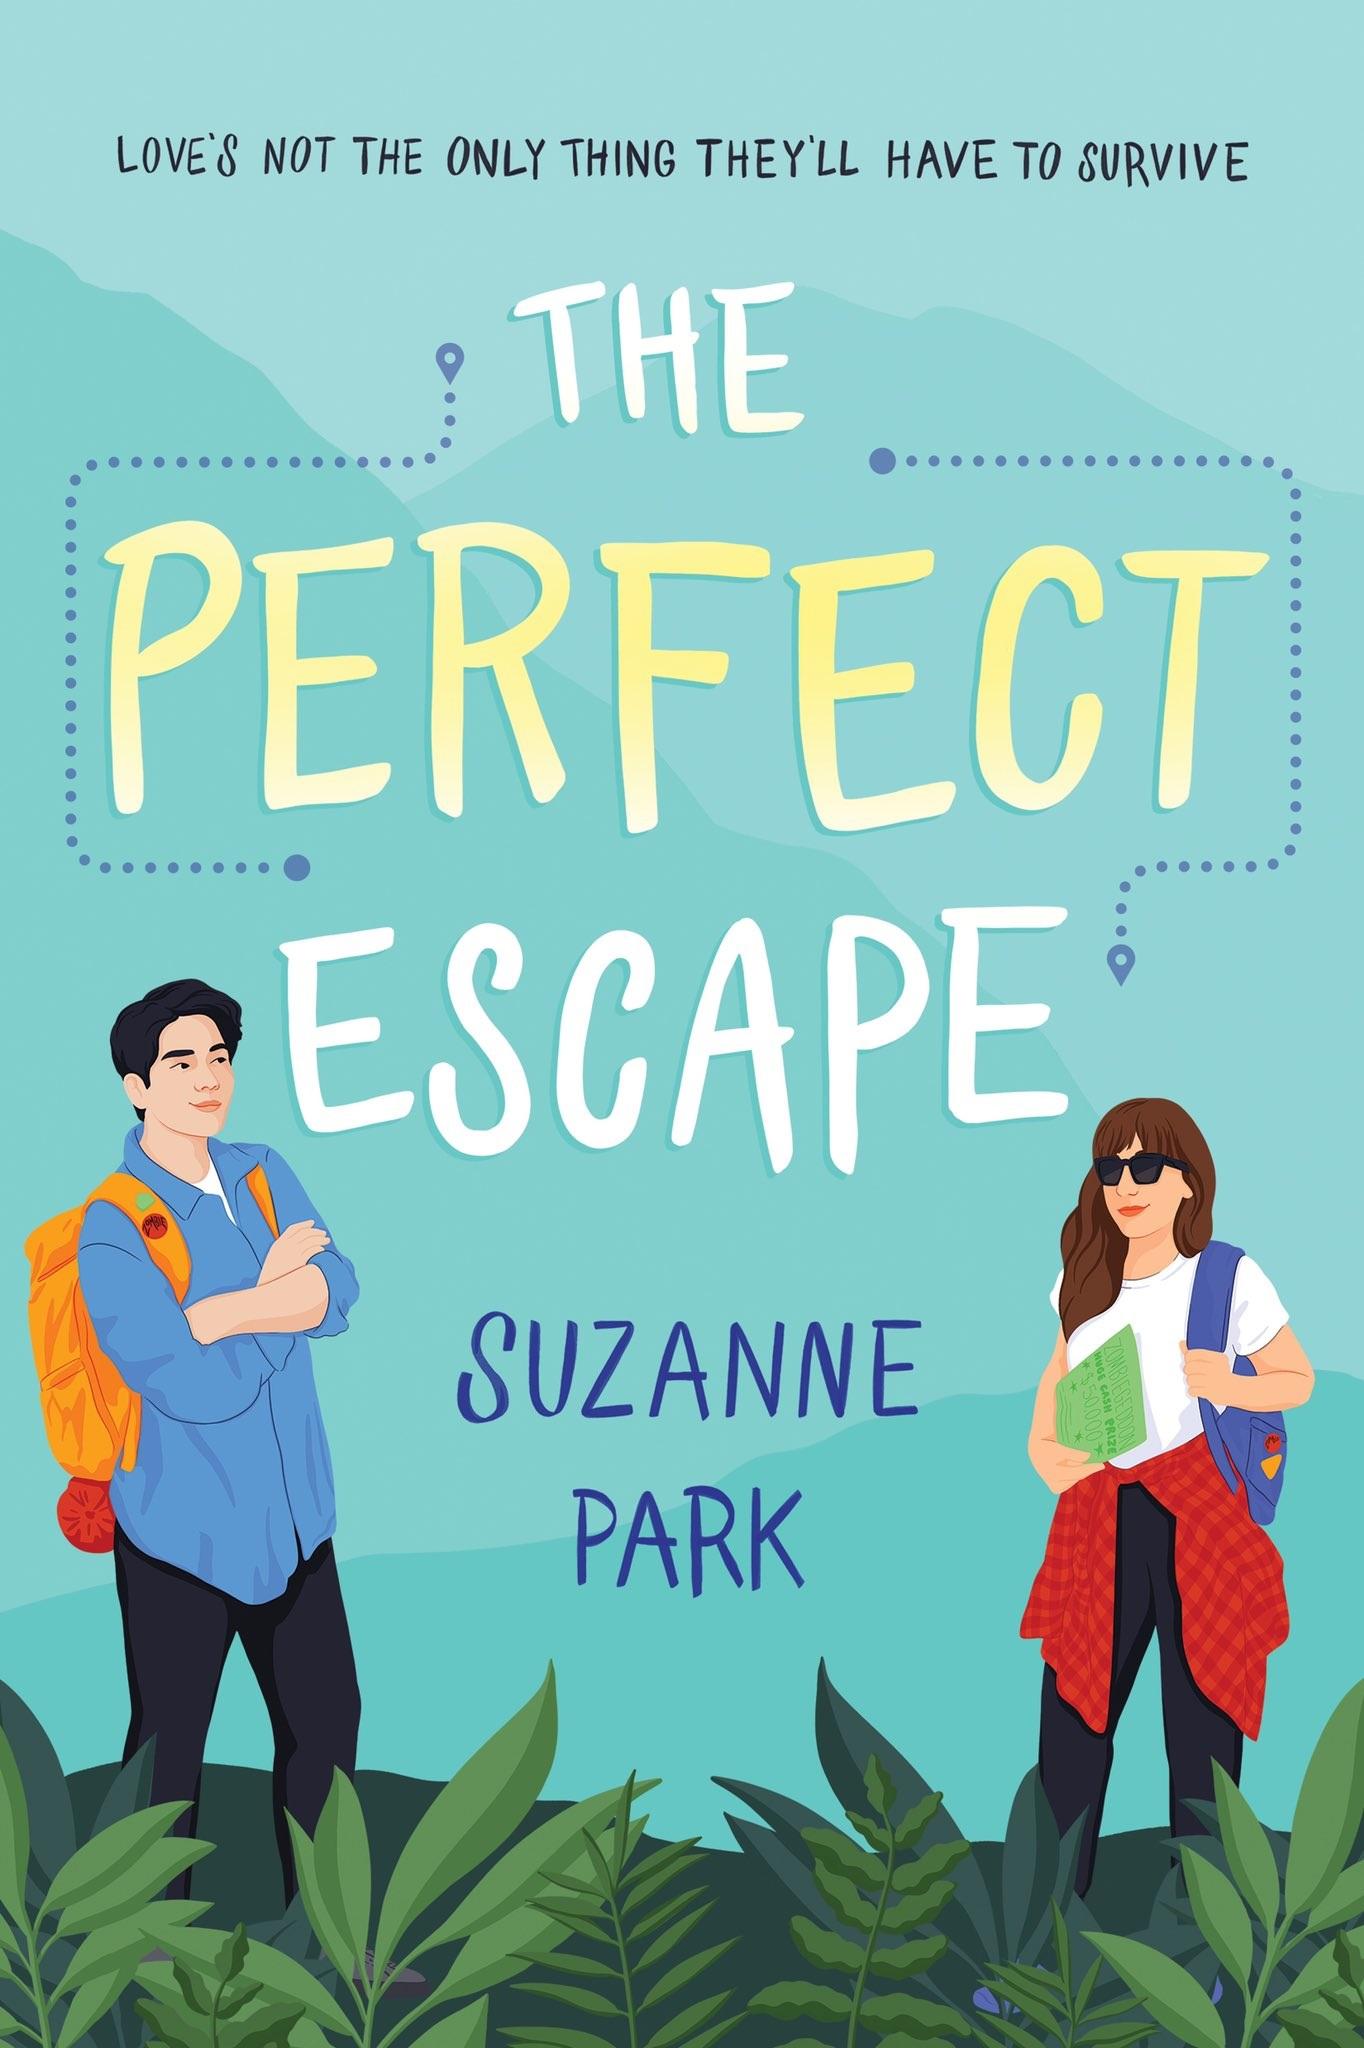 The Perfect Escape by Suzanne Park